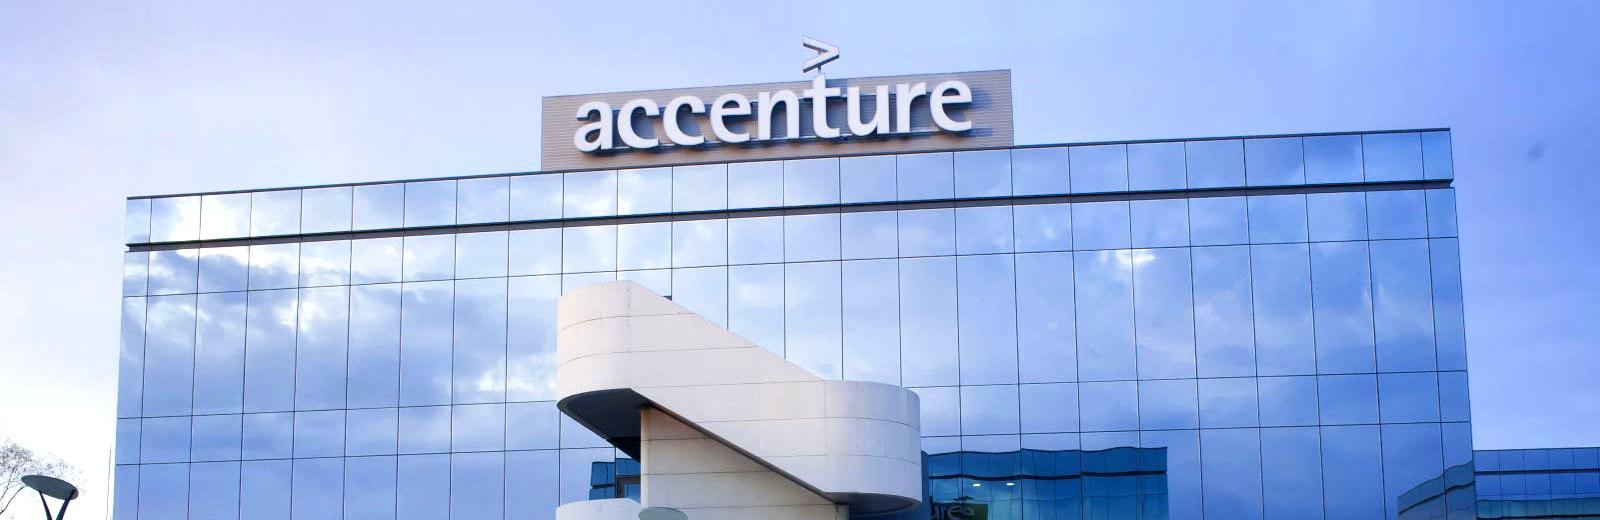 Accenture forecasts shortfall in 2nd quarter revenues